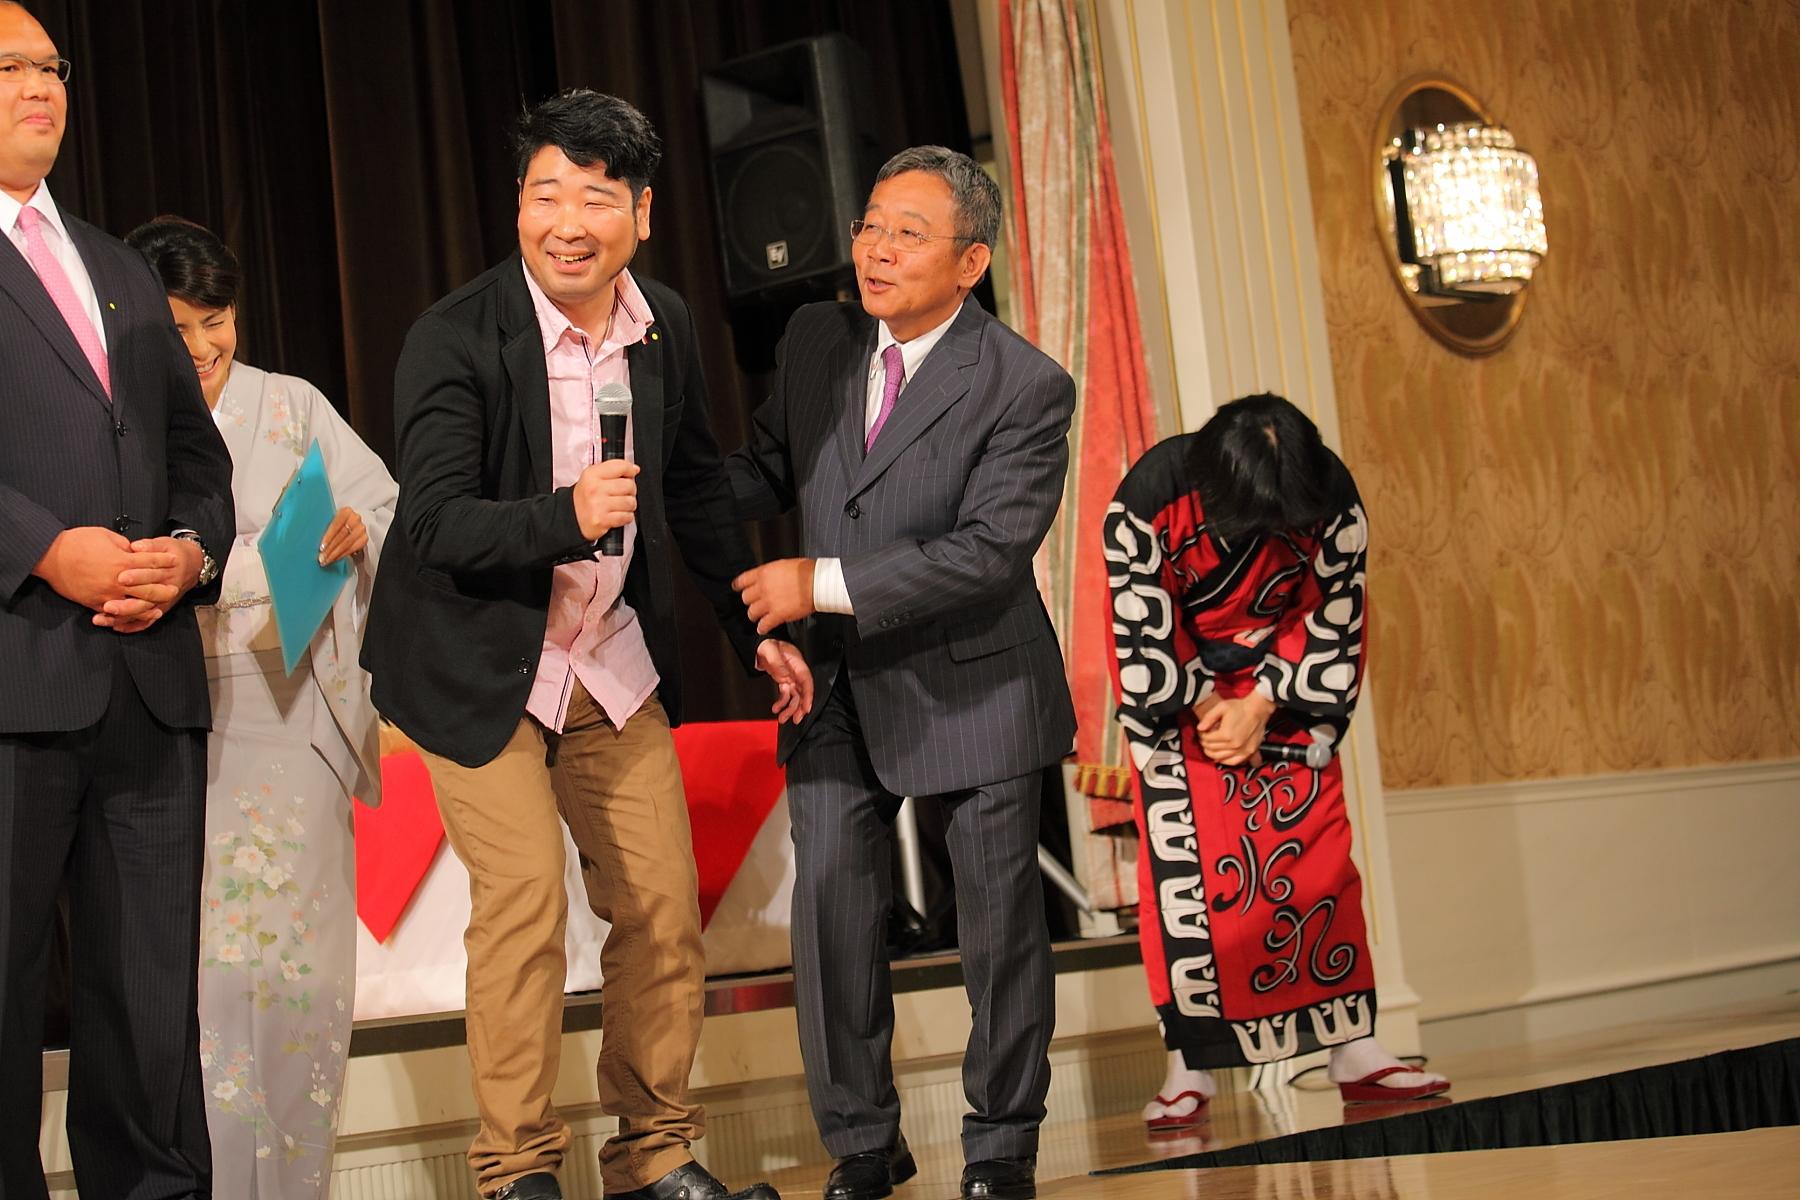 http://news.yoshimoto.co.jp/photos/uncategorized/2015/06/29/20150629180449-575491370617a7b5decfa6f6bcdbd5a0ced4450e.jpg